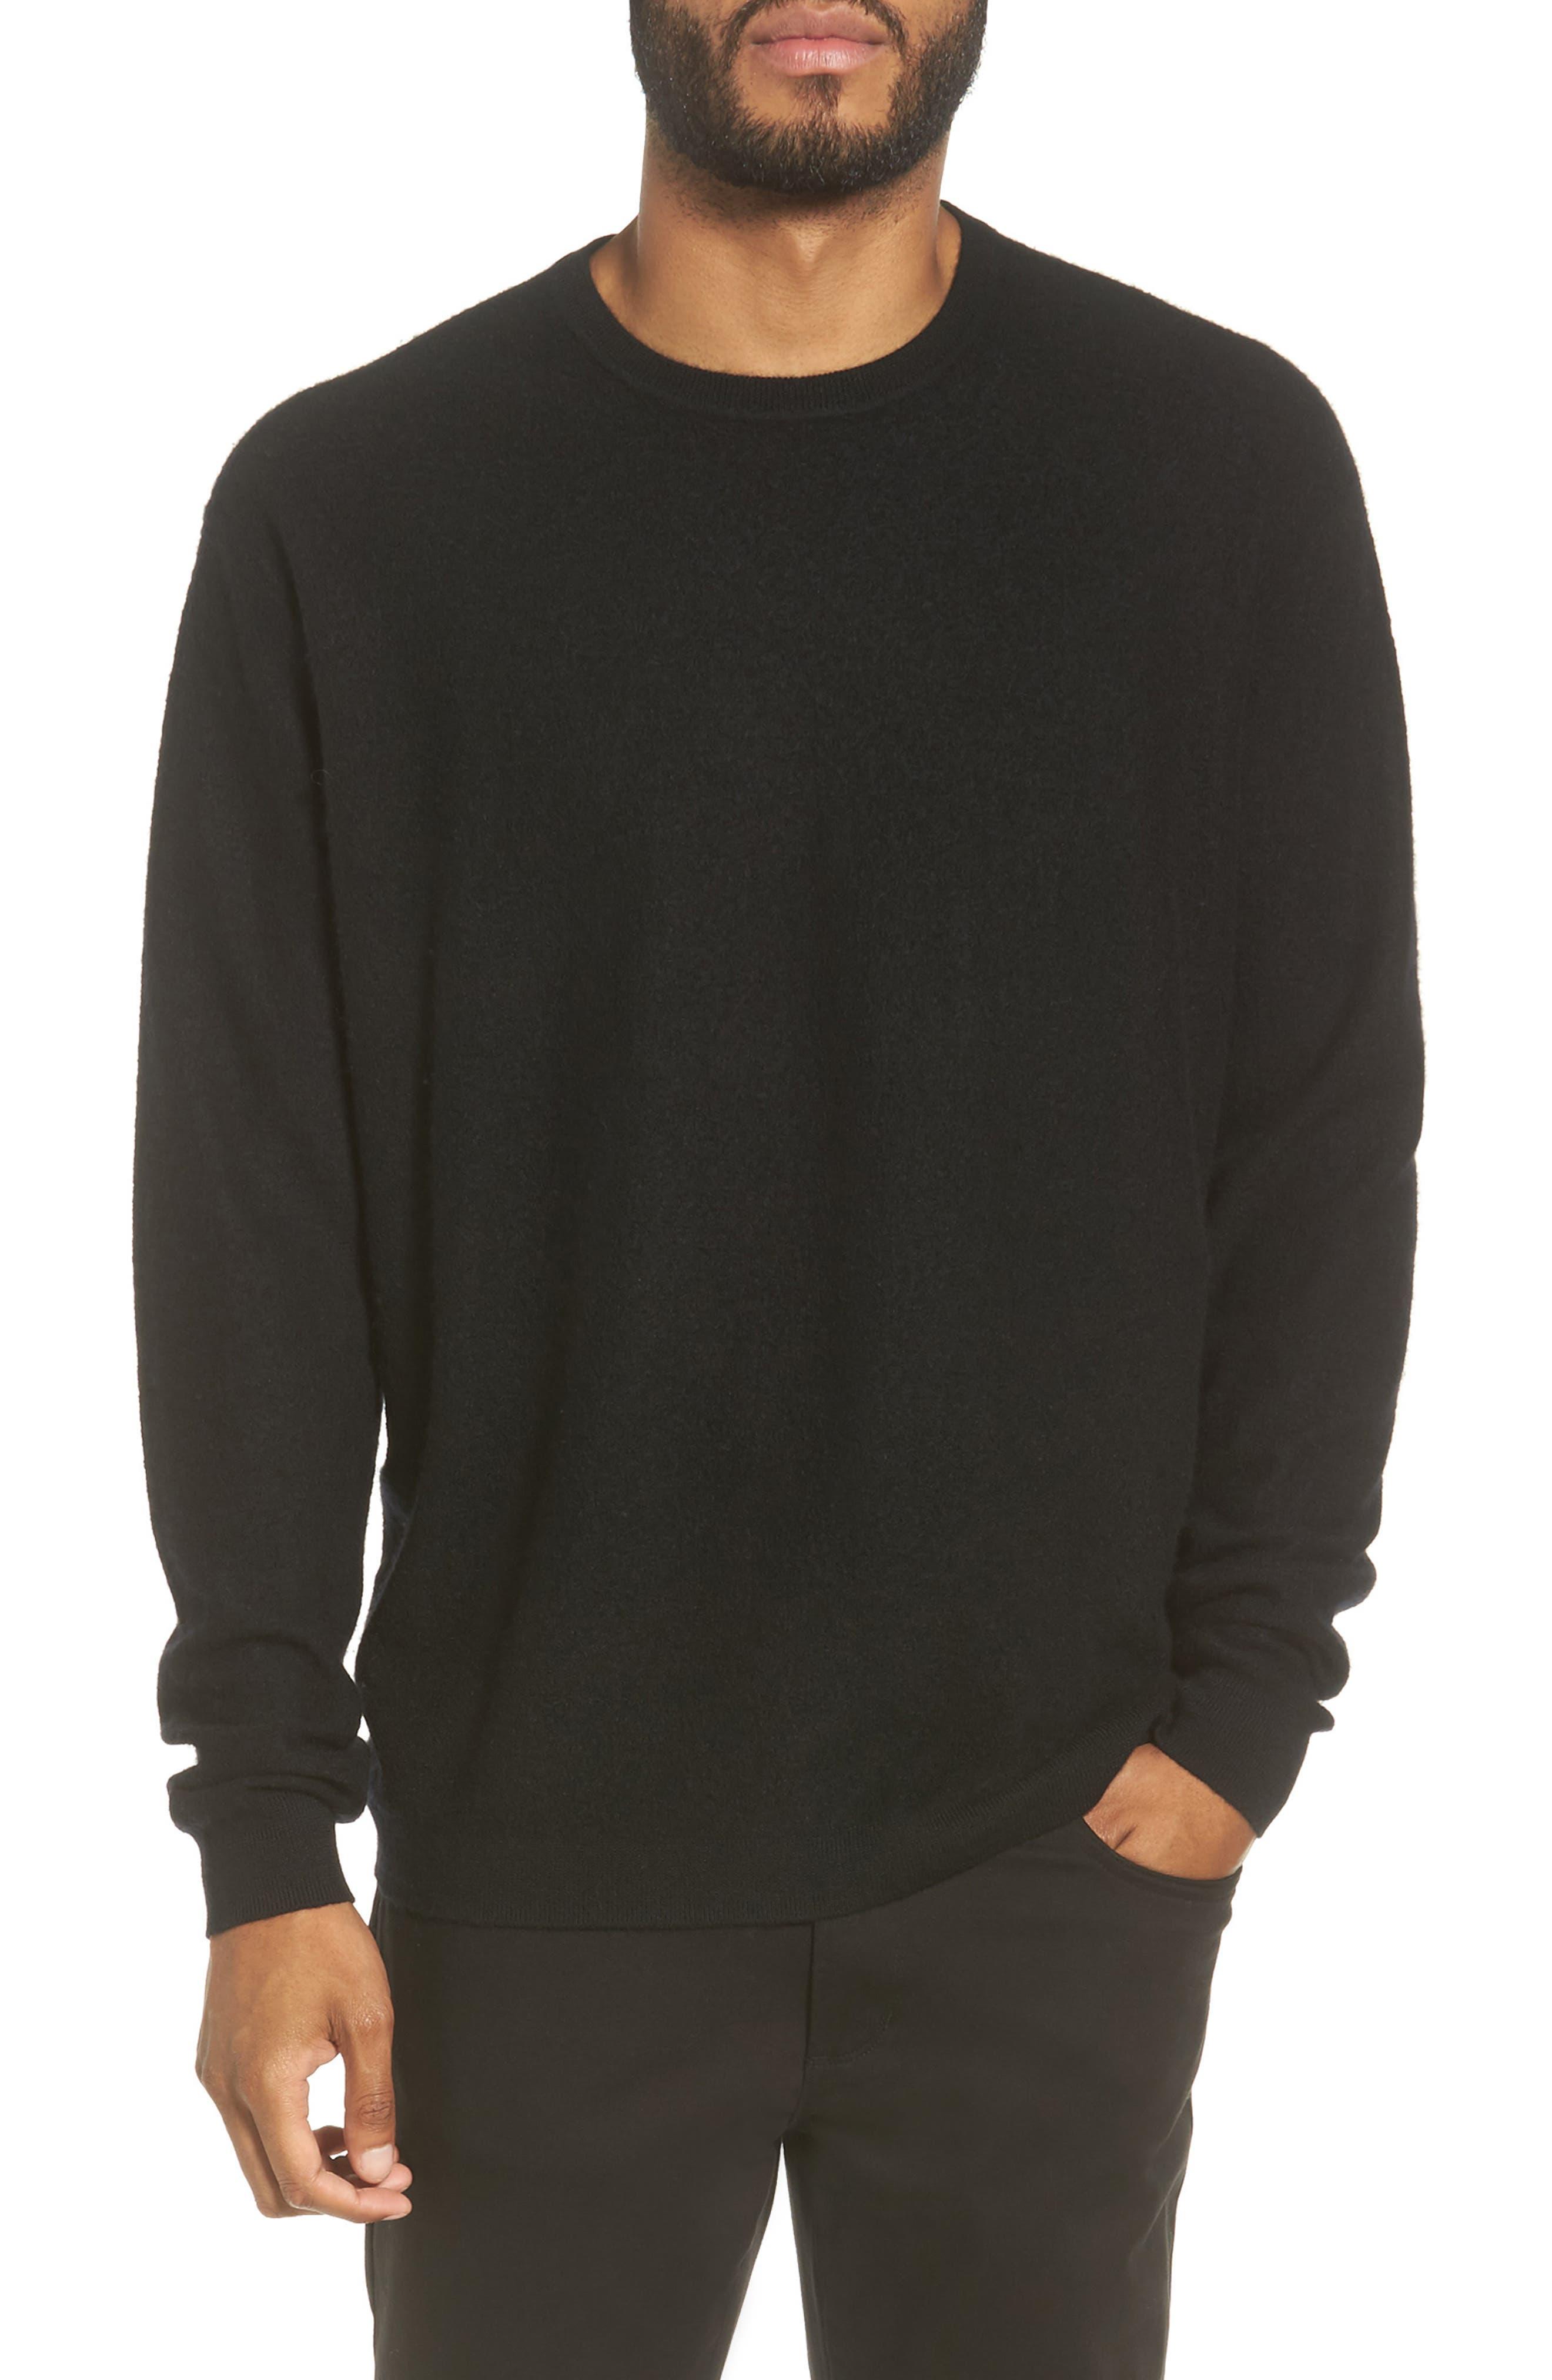 Cashmere Crewneck Sweater,                             Main thumbnail 1, color,                             001